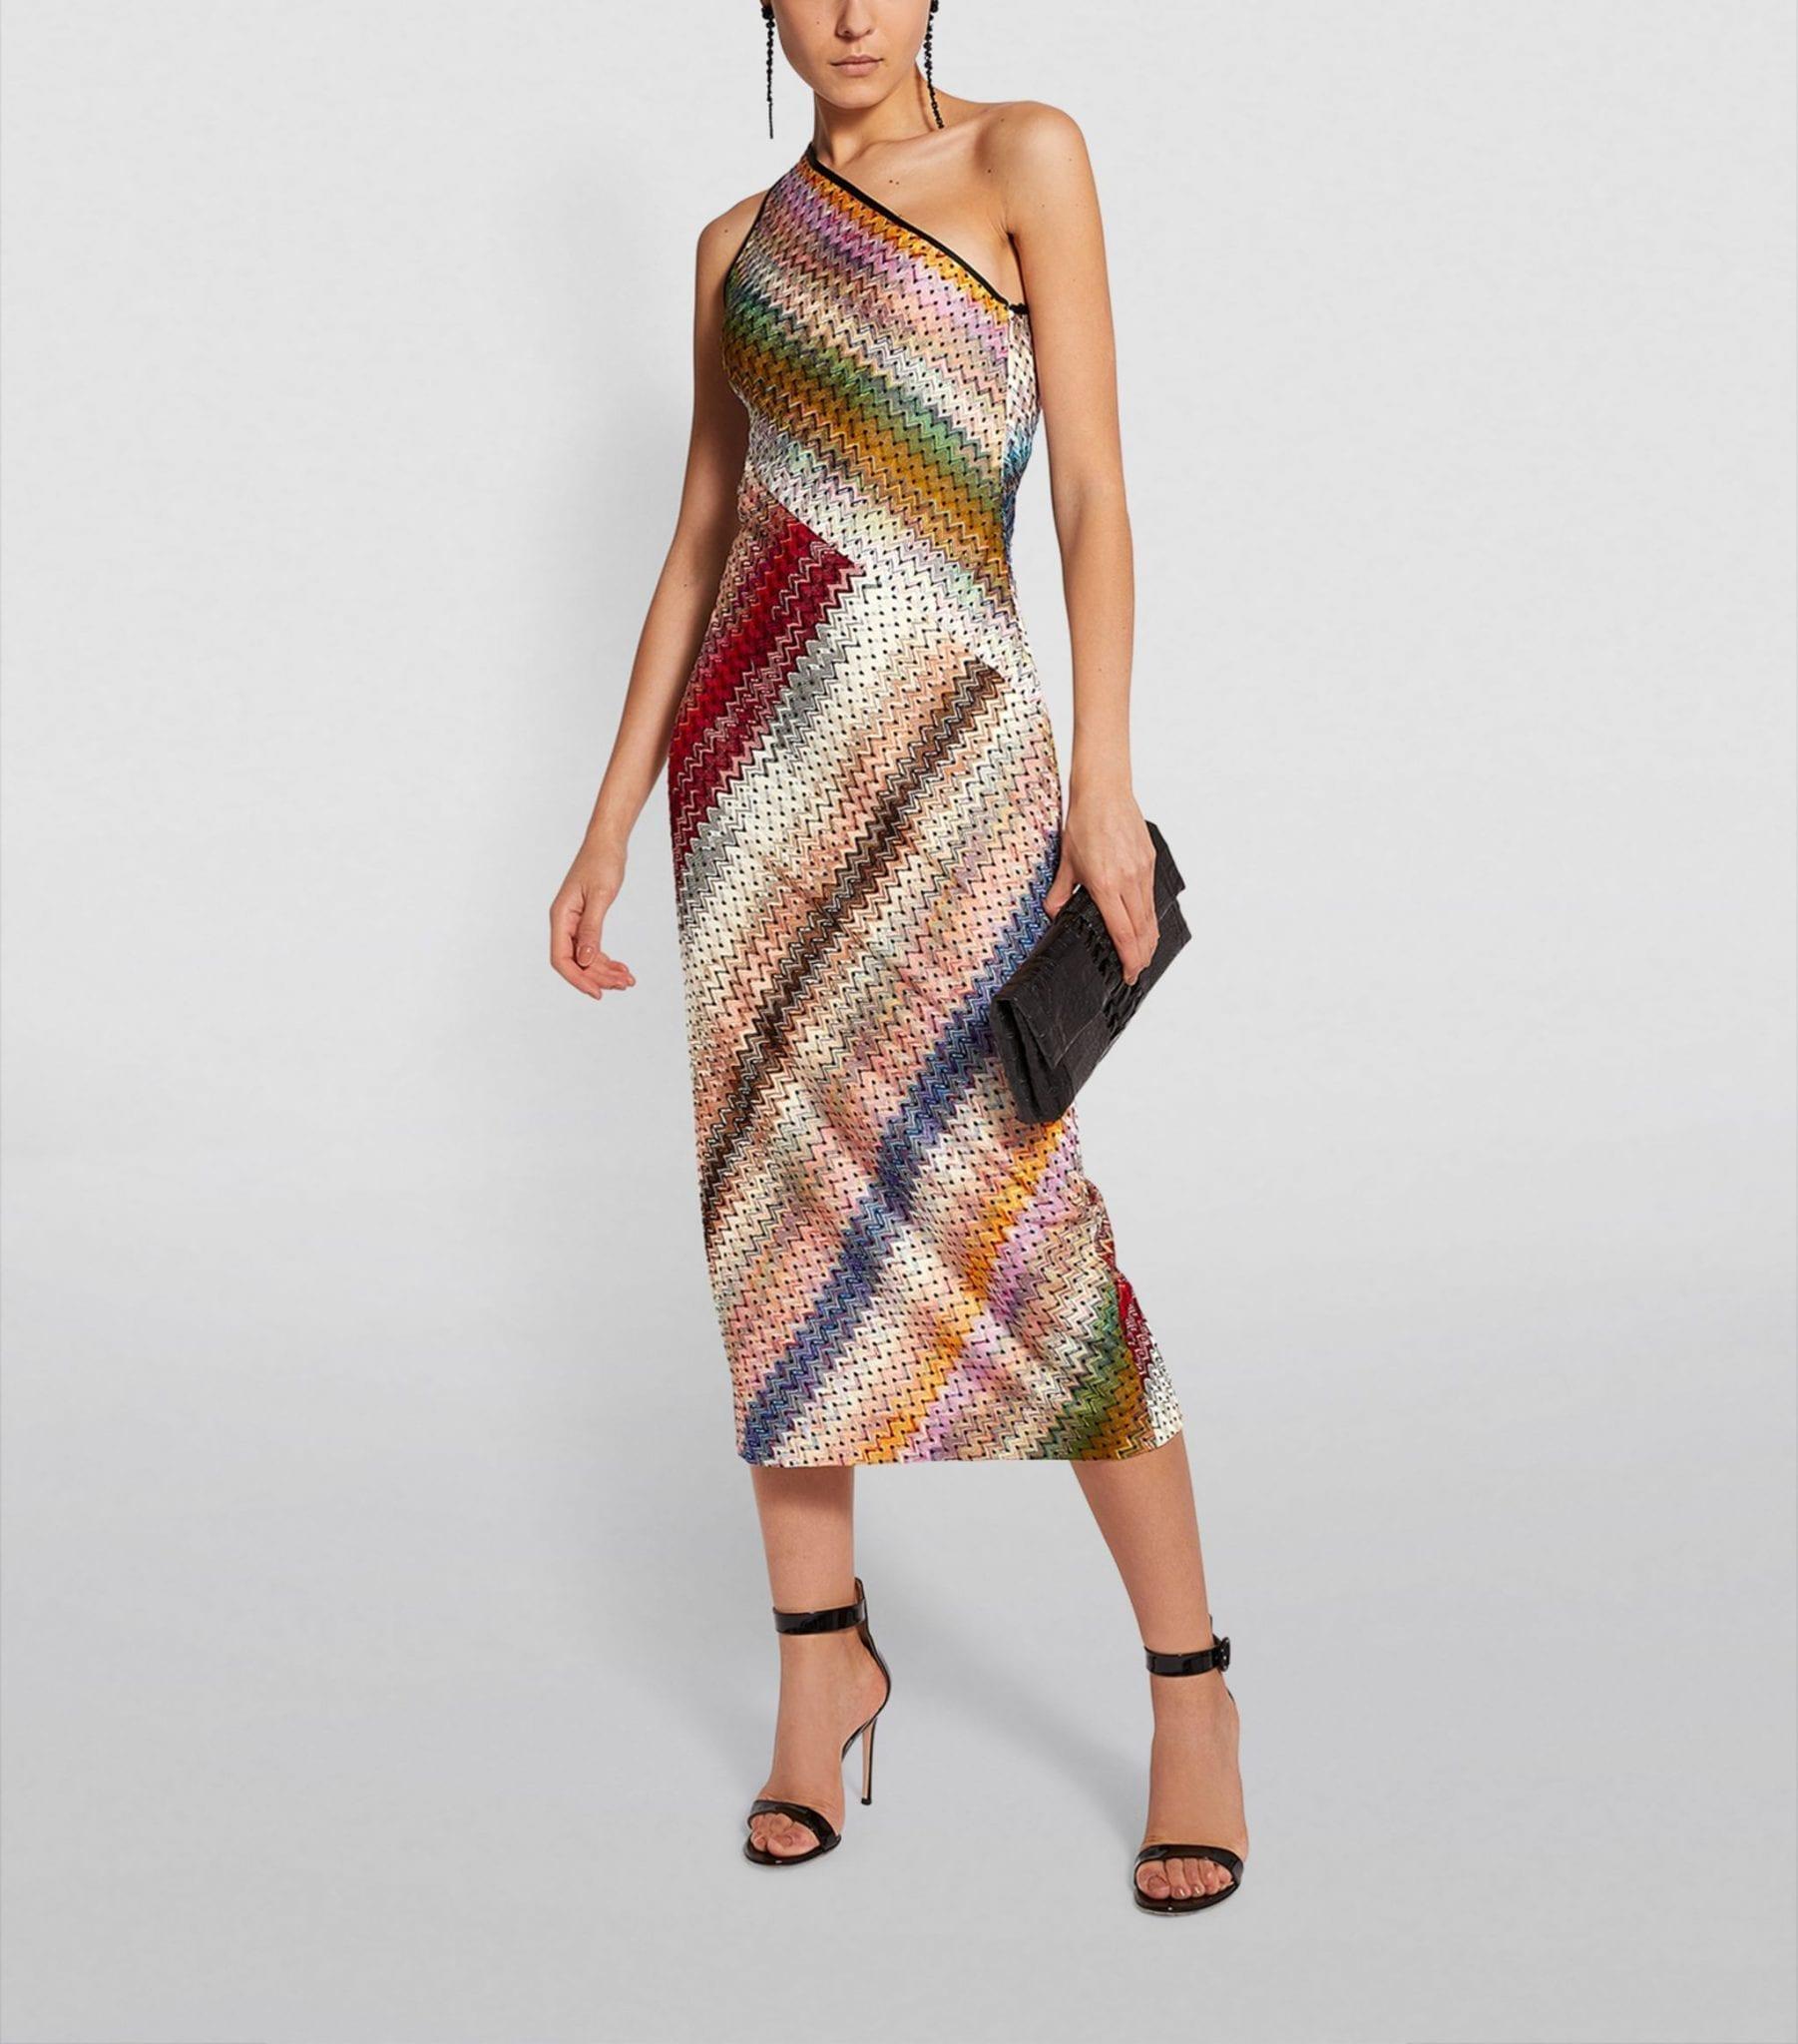 MISSONI One-Shoulder Striped Dress